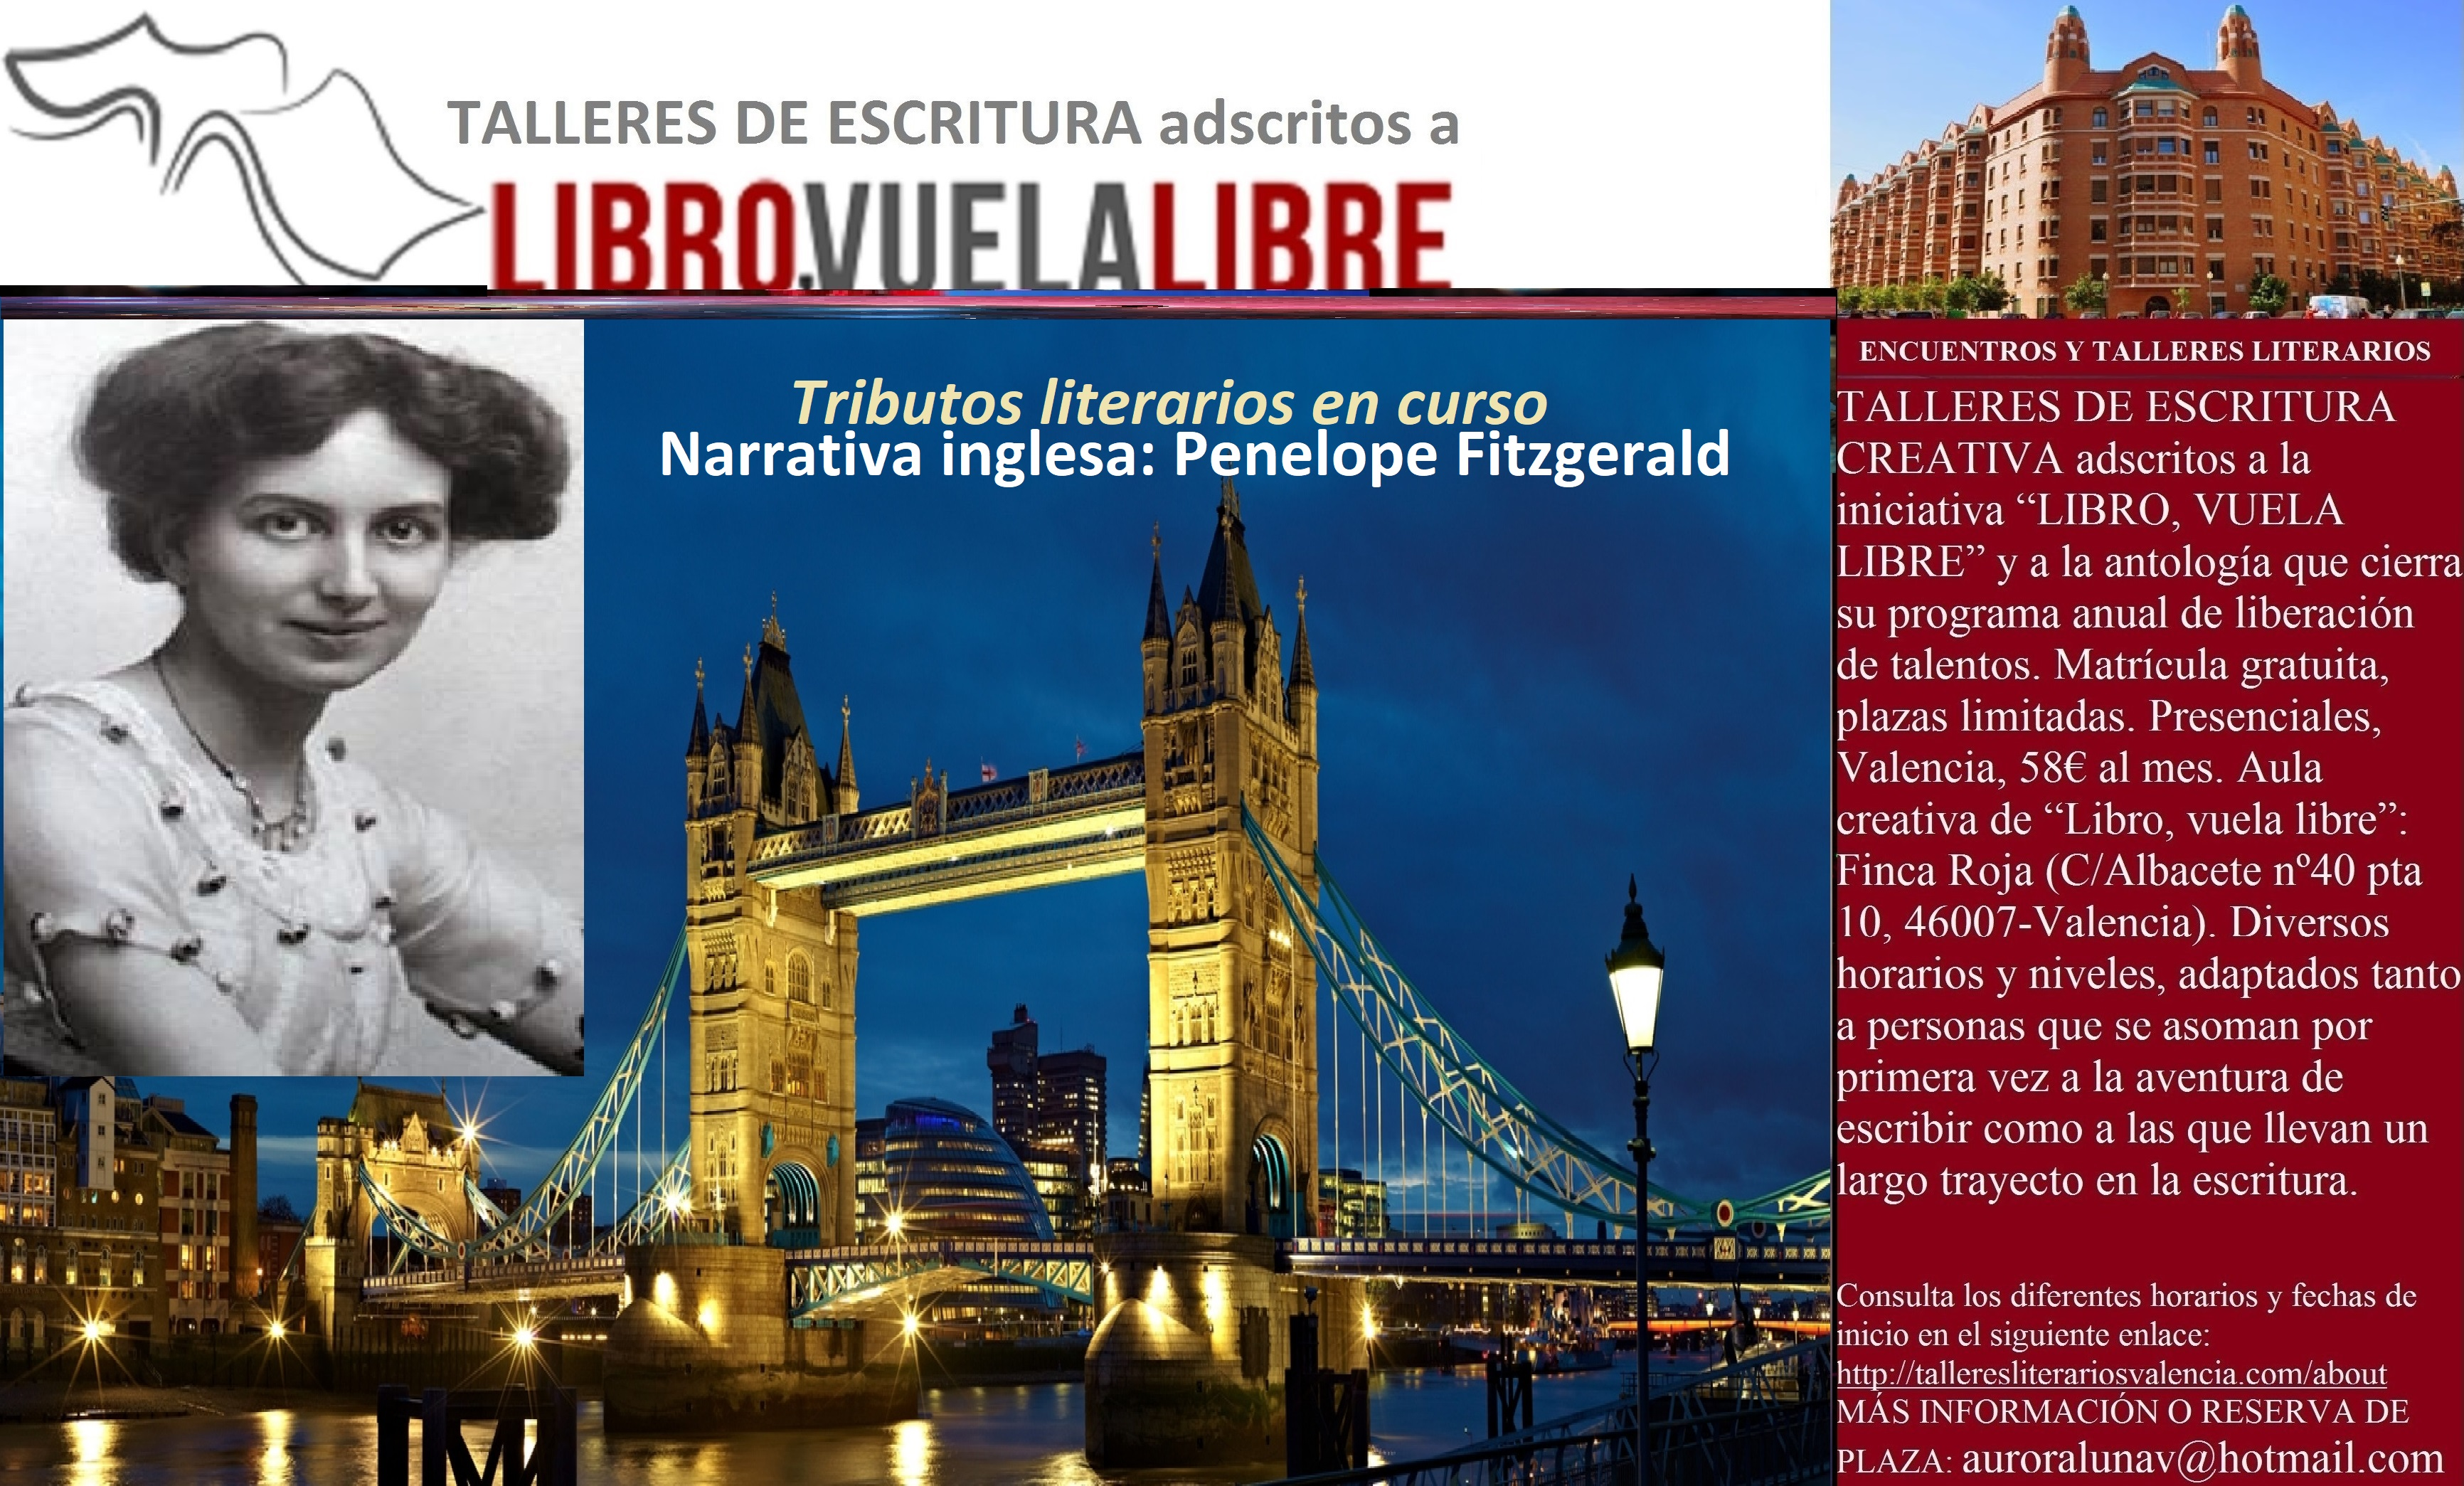 NARRATIVA INGLESA. Cursos de escritura creativa en Valencia, tributos